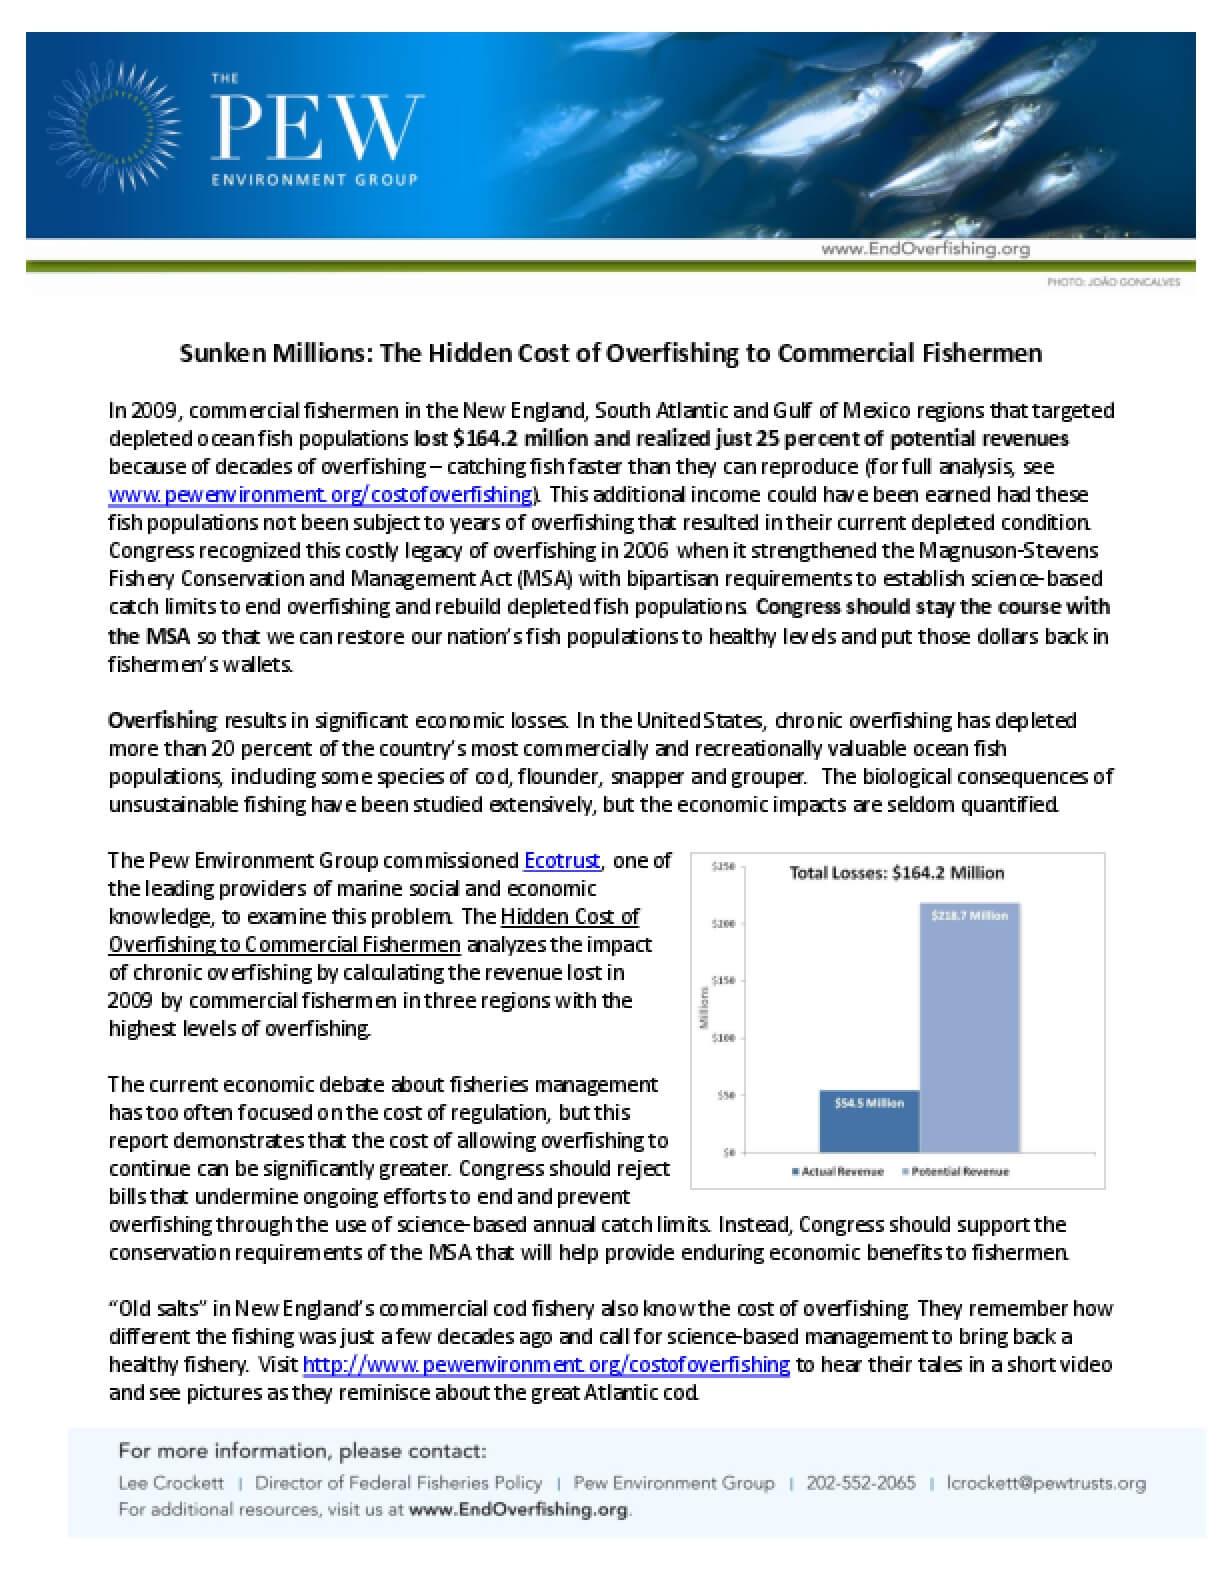 Sunken Millions: The Hidden Cost of Overfishing to Commercial Fishermen